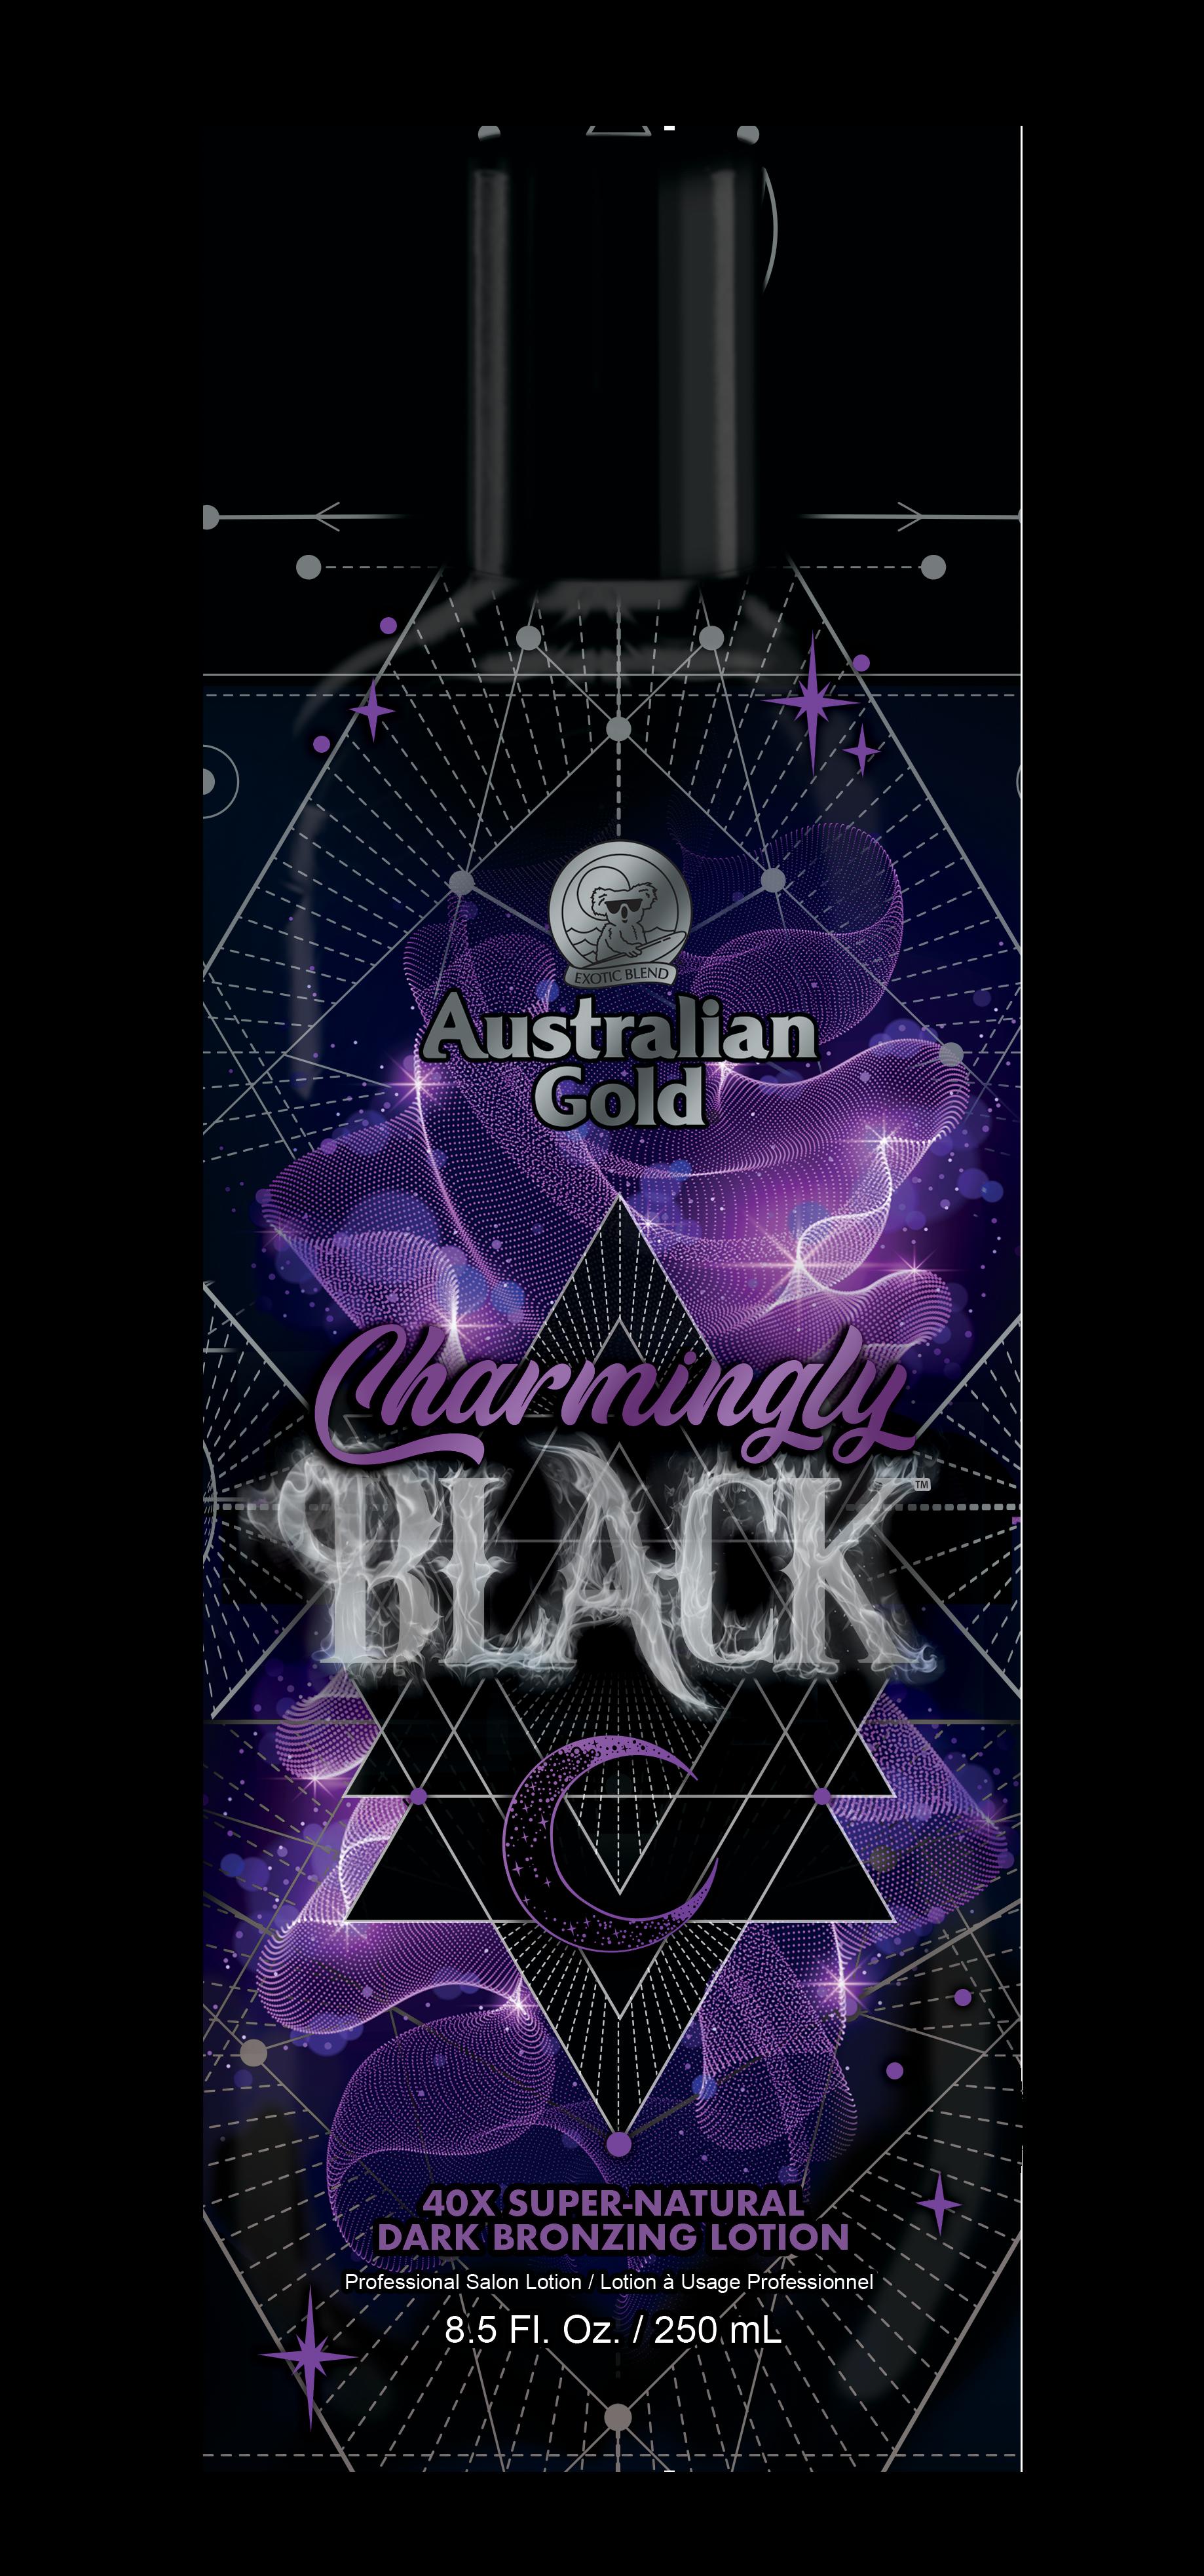 Australian Gold - Charmingly Black Dark Bronzing Lotion 250 ml